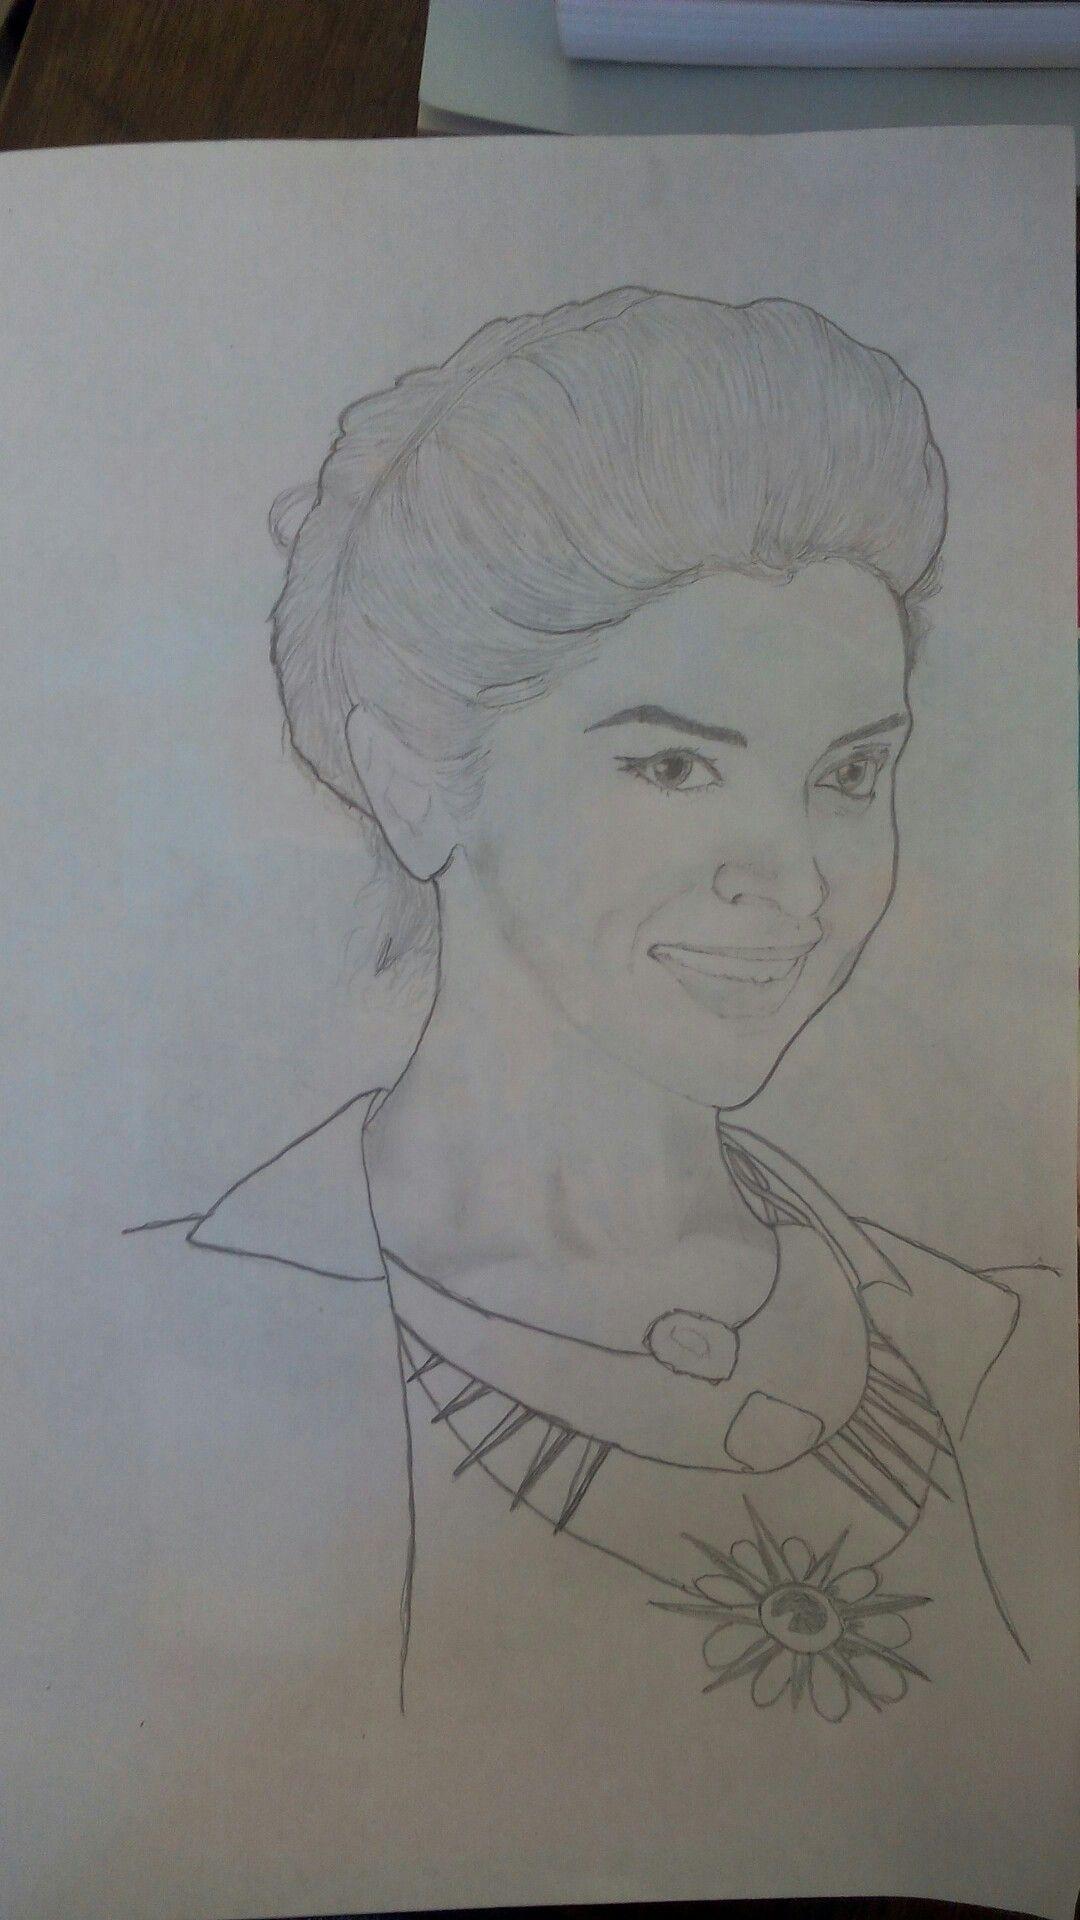 Deepika Padukone, Sketch, Pencil